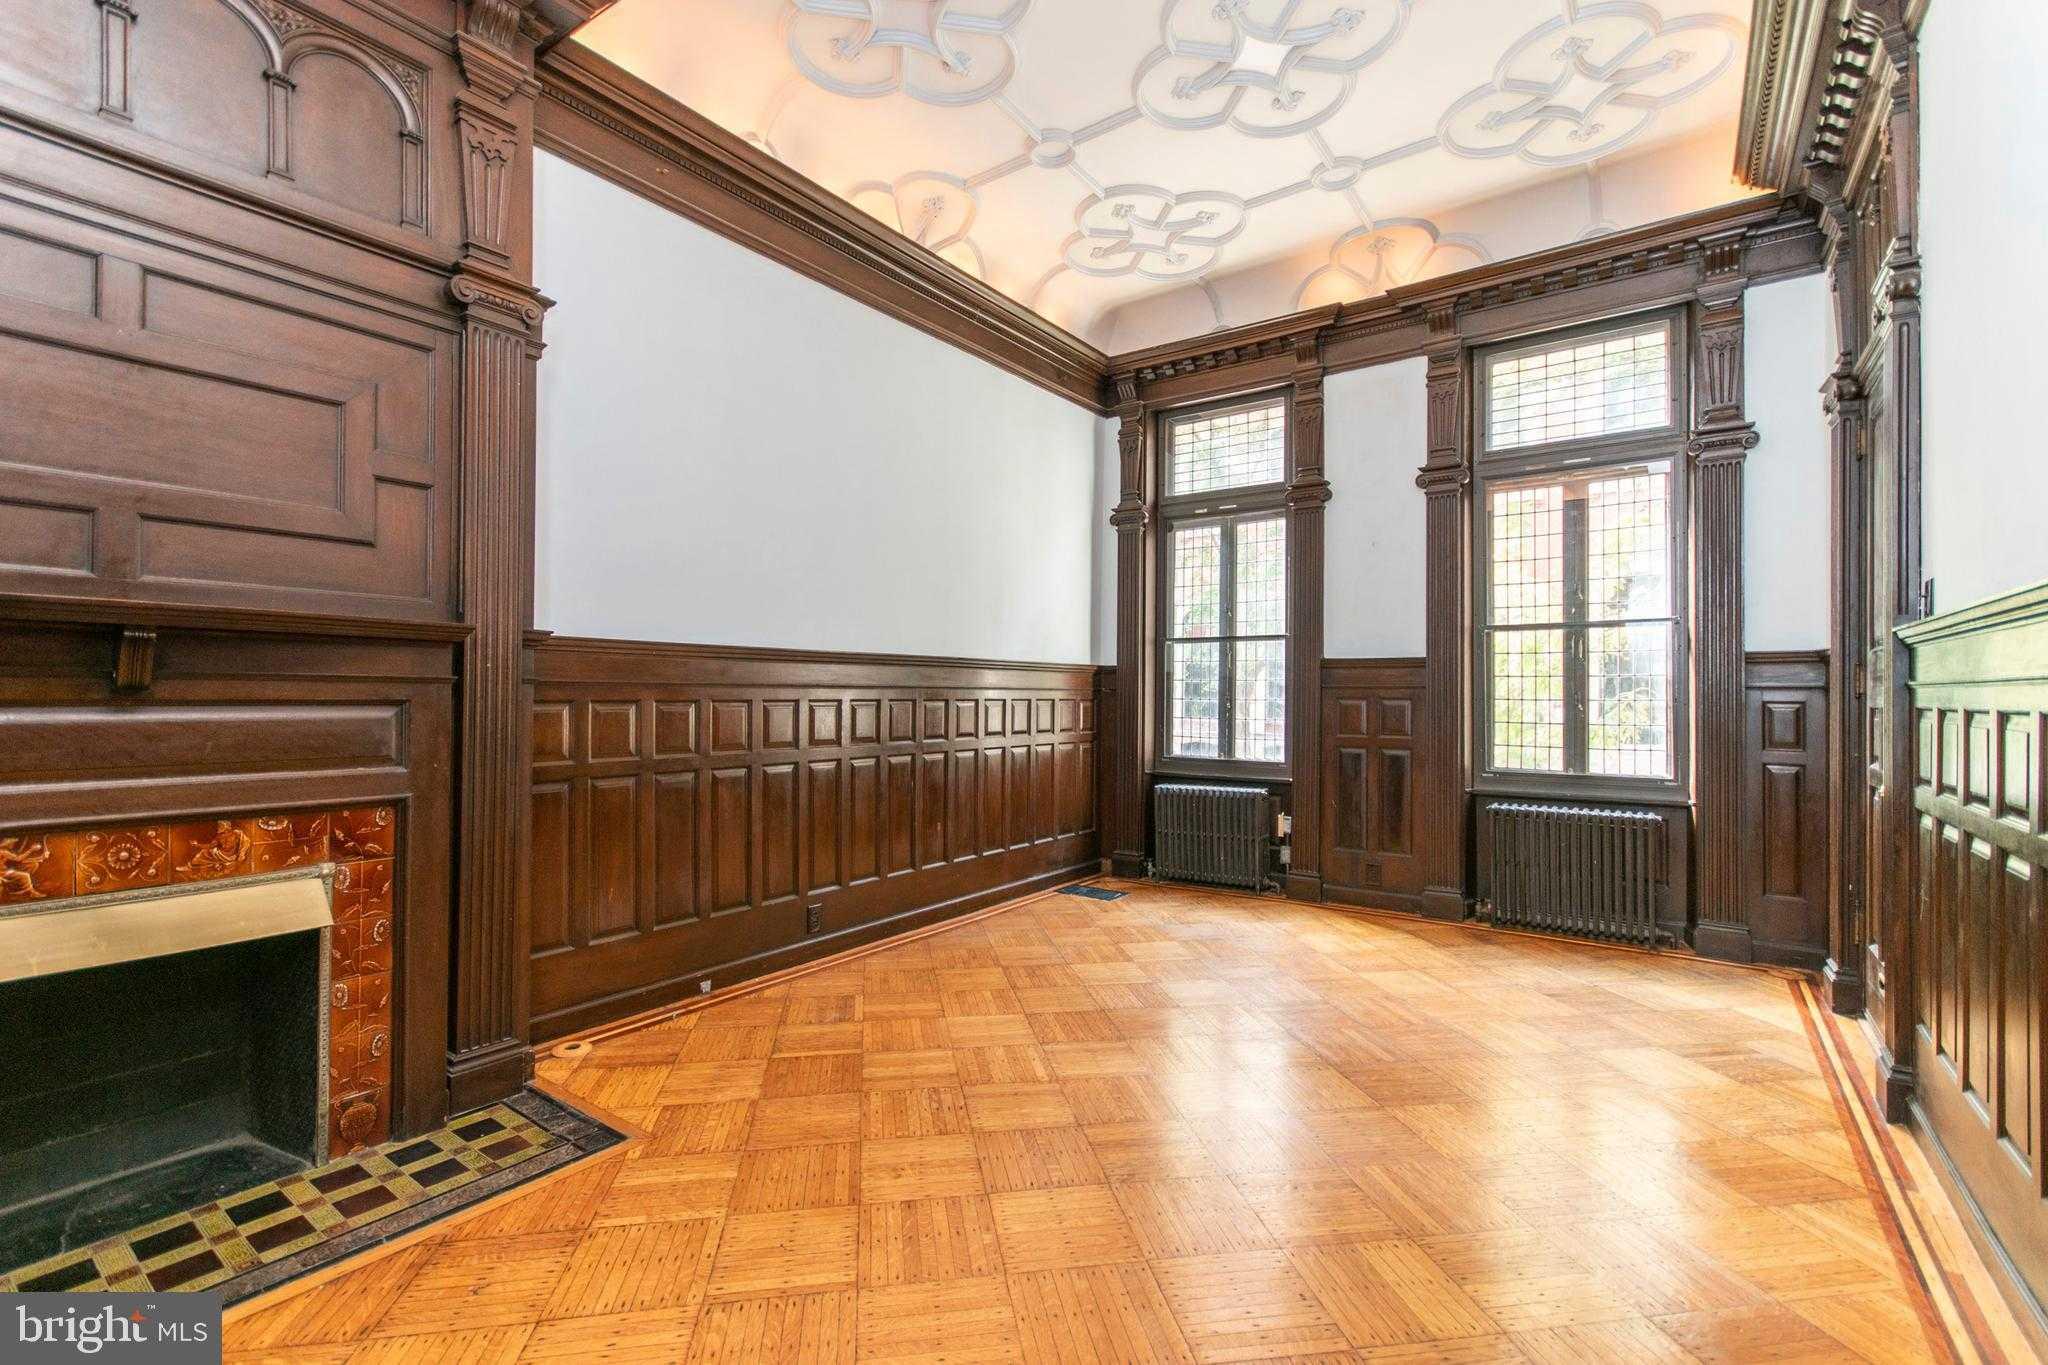 $399,900 - 1Br/1Ba -  for Sale in Rittenhouse Square, Philadelphia